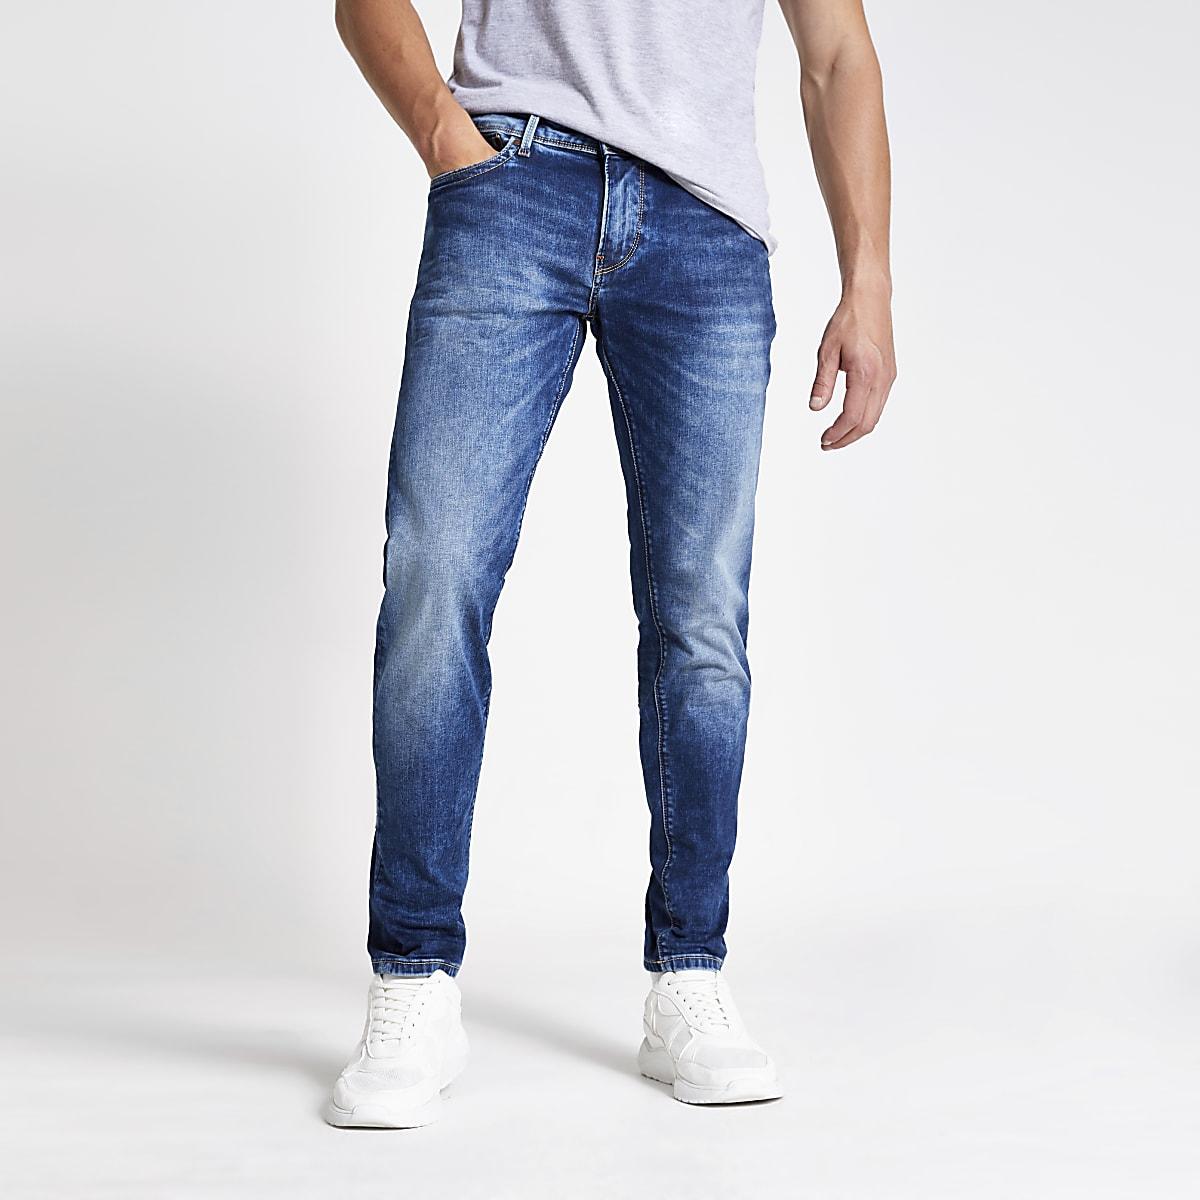 Pepe Jeans - Blauwe slim-fit jeans